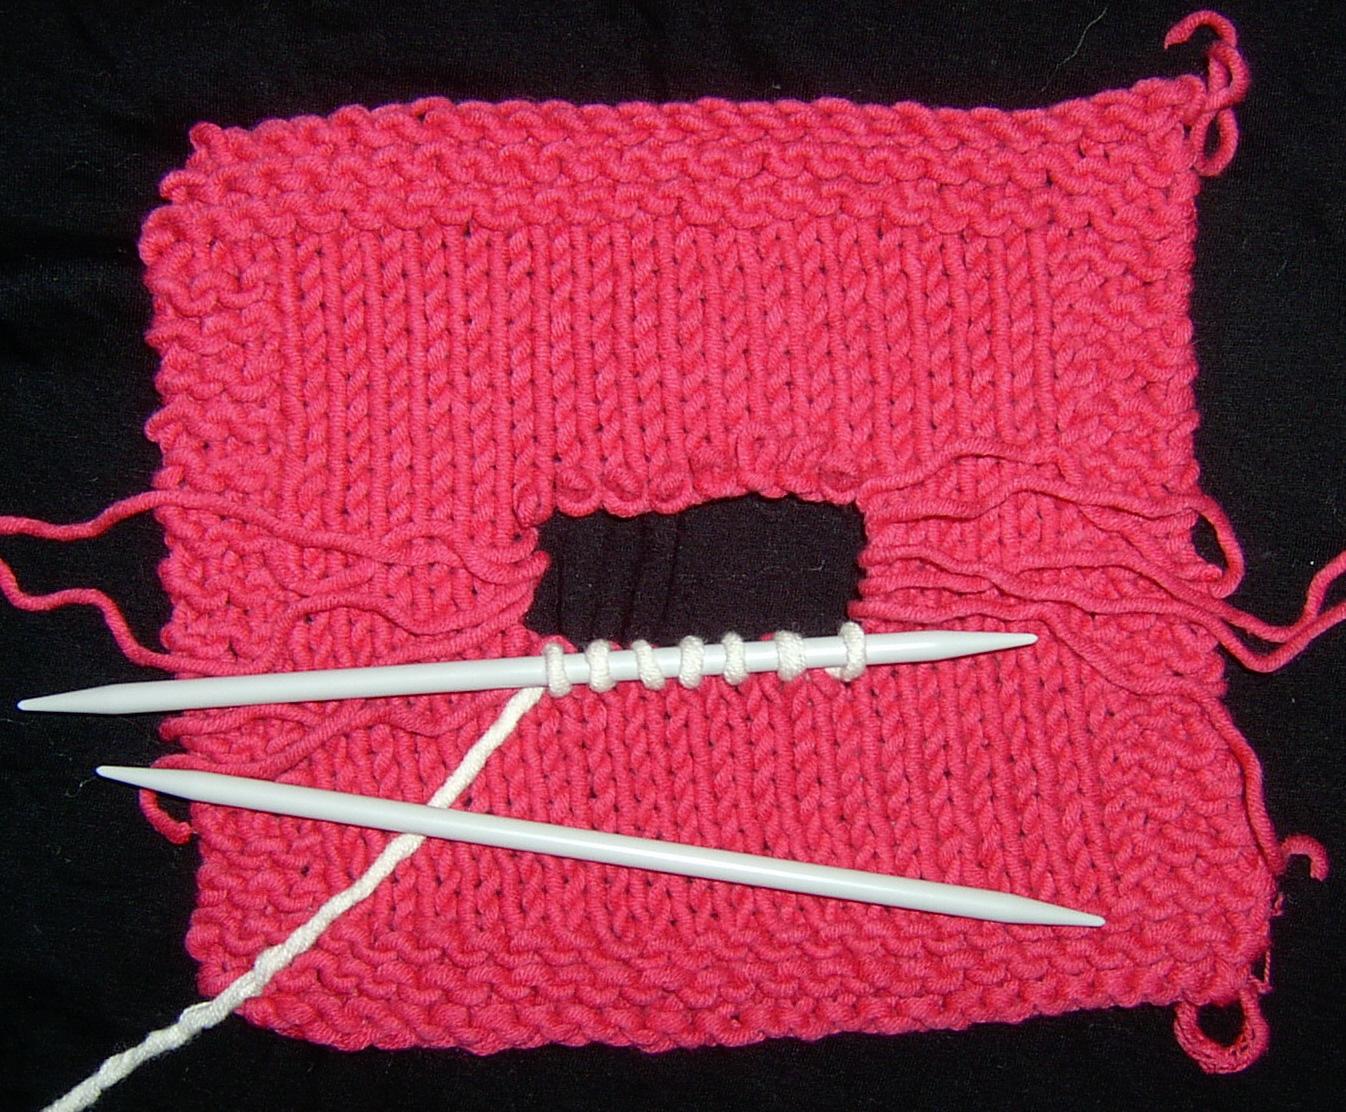 Knitting Lifeline Hole : Knitty repairs